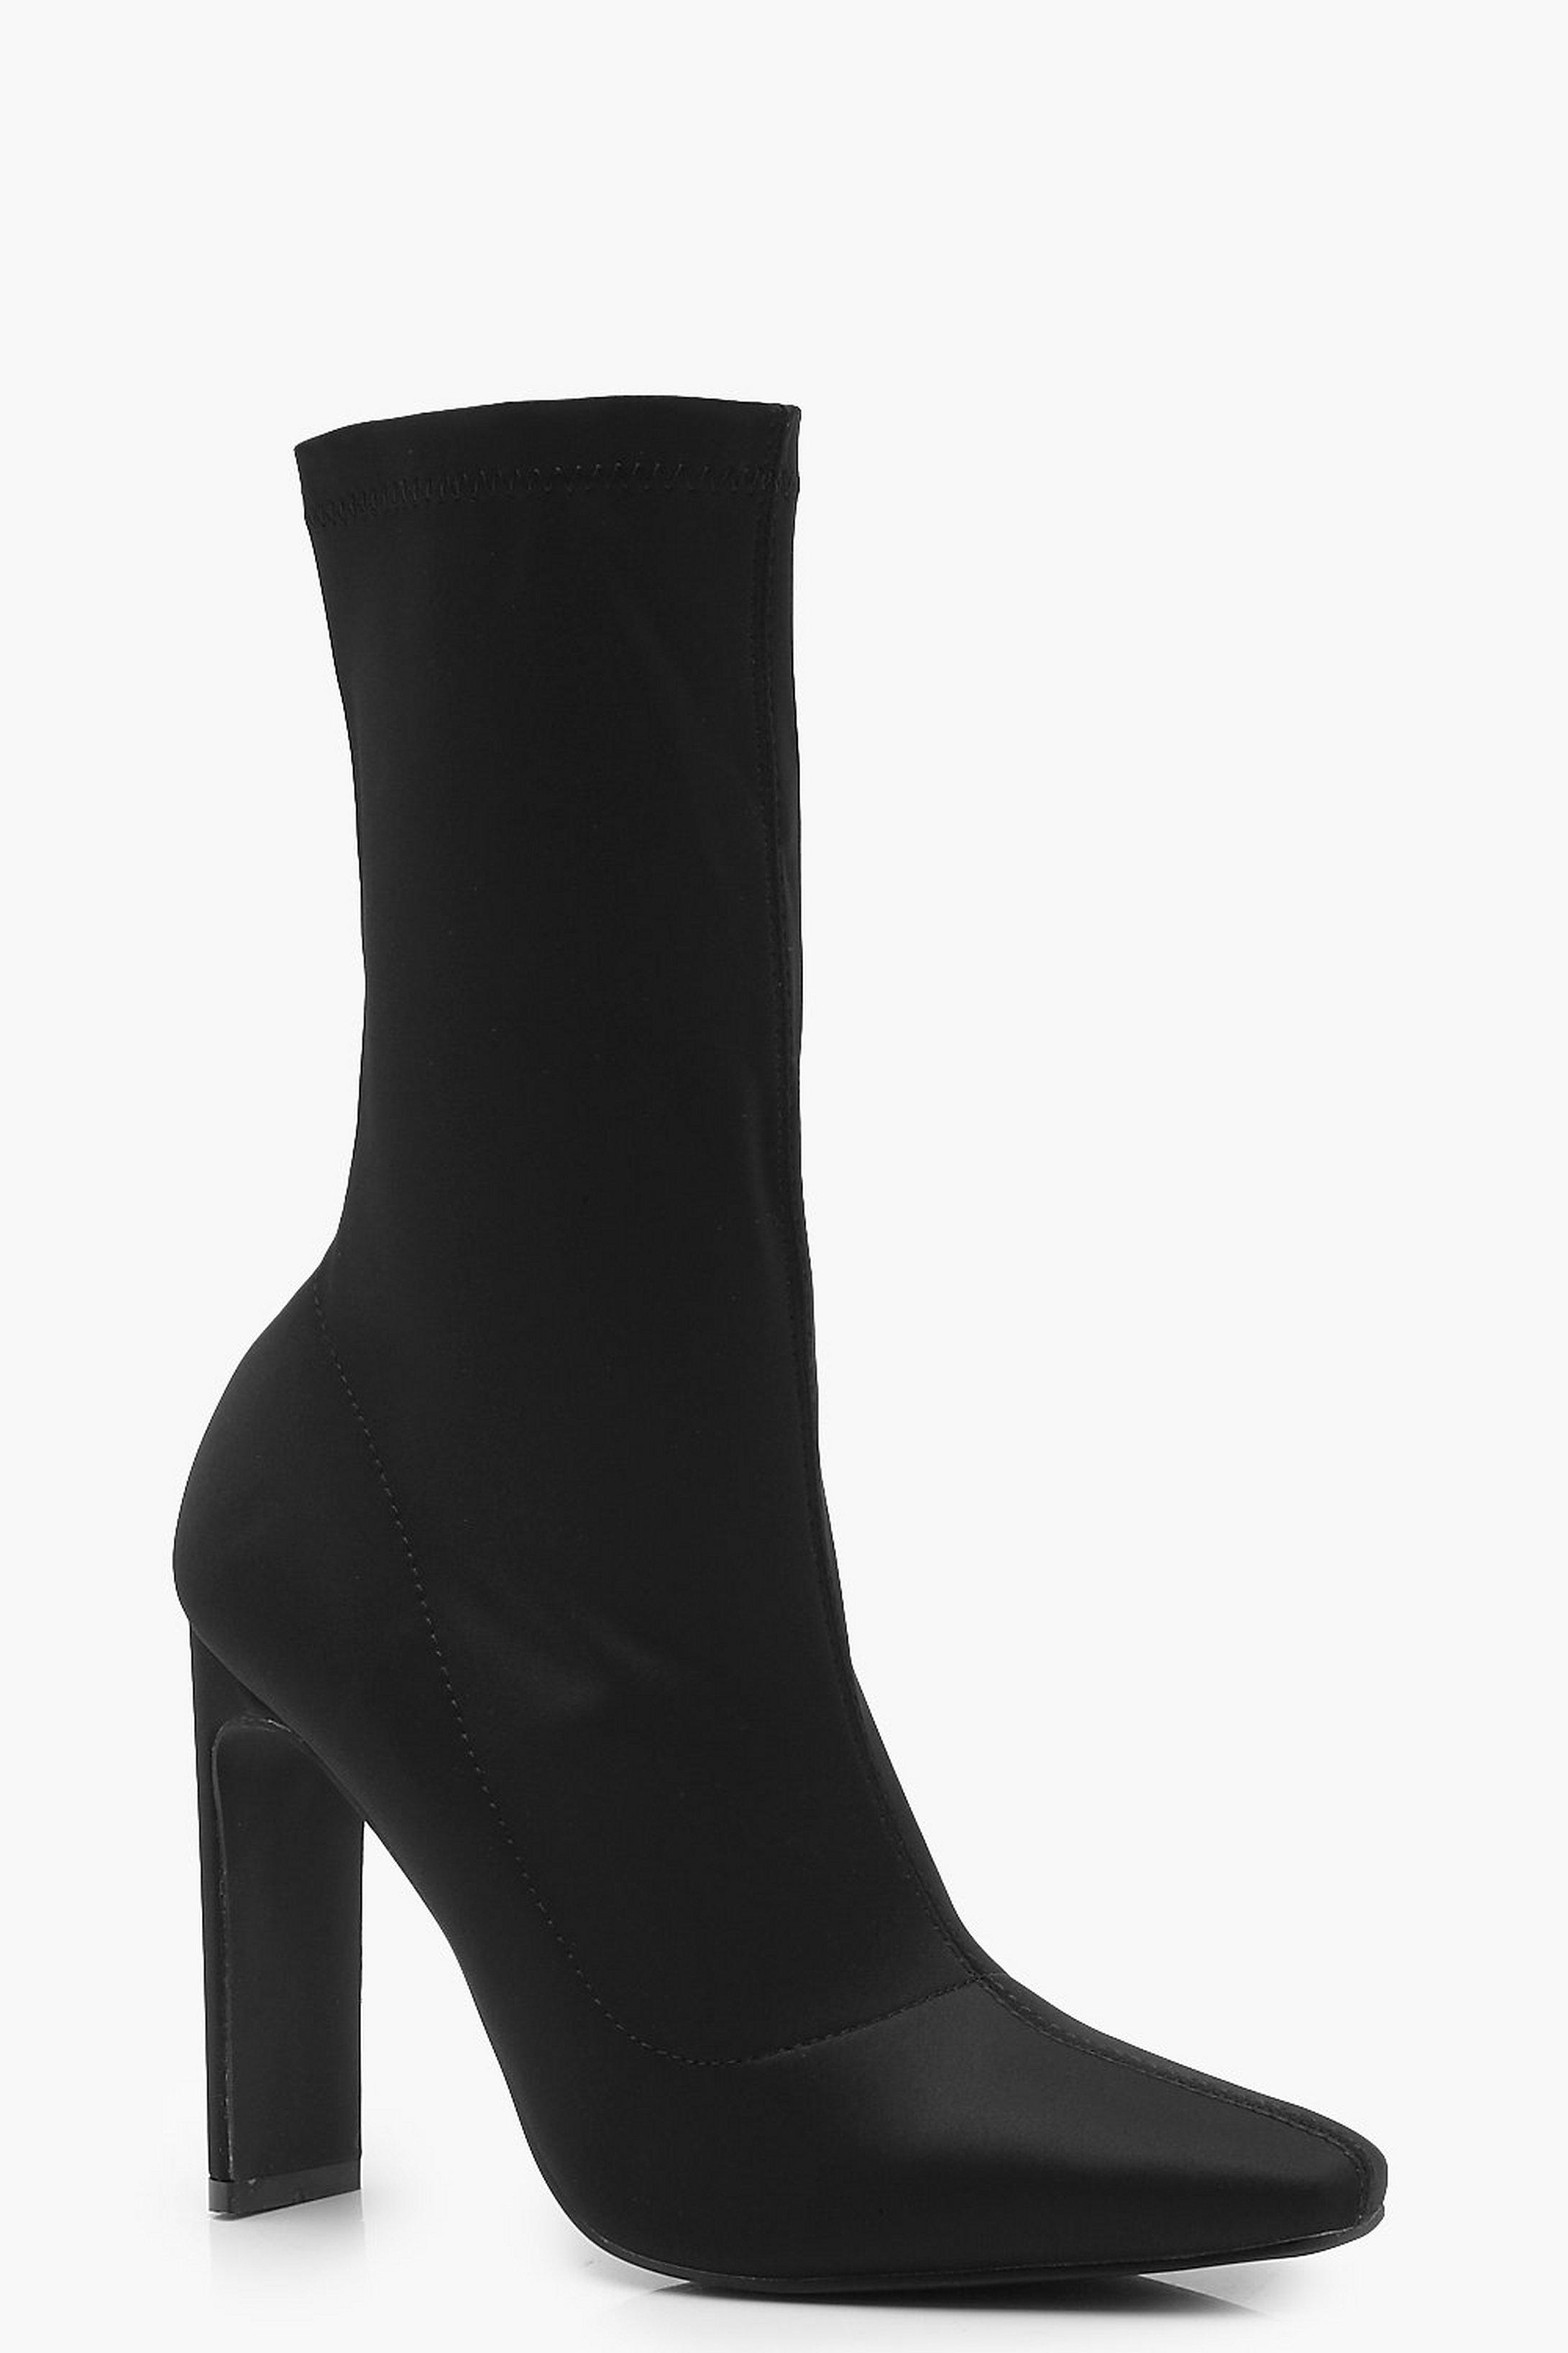 separation shoes 69791 79824 Schmale Ankle Boots mit geradem Absatz